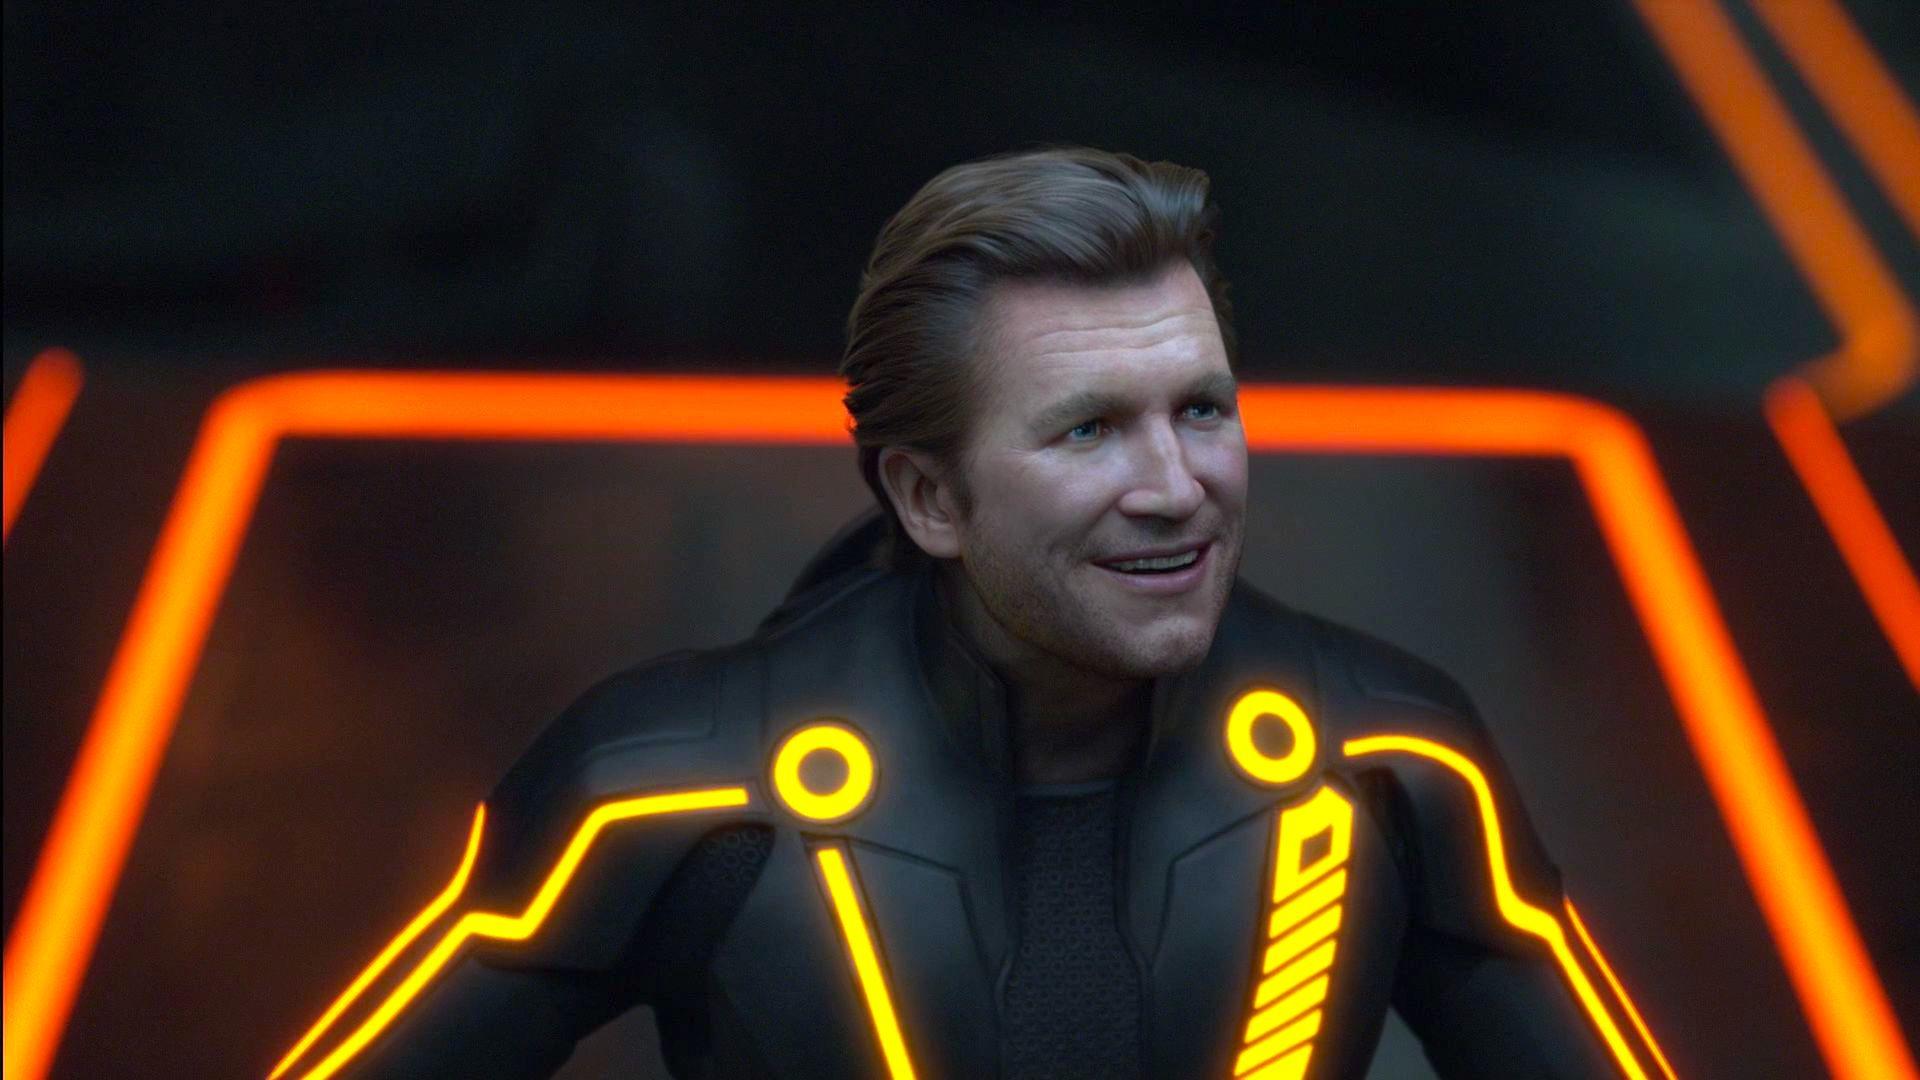 CLU aka digital Jeff Bridges smiles wide in Tron: Legacy